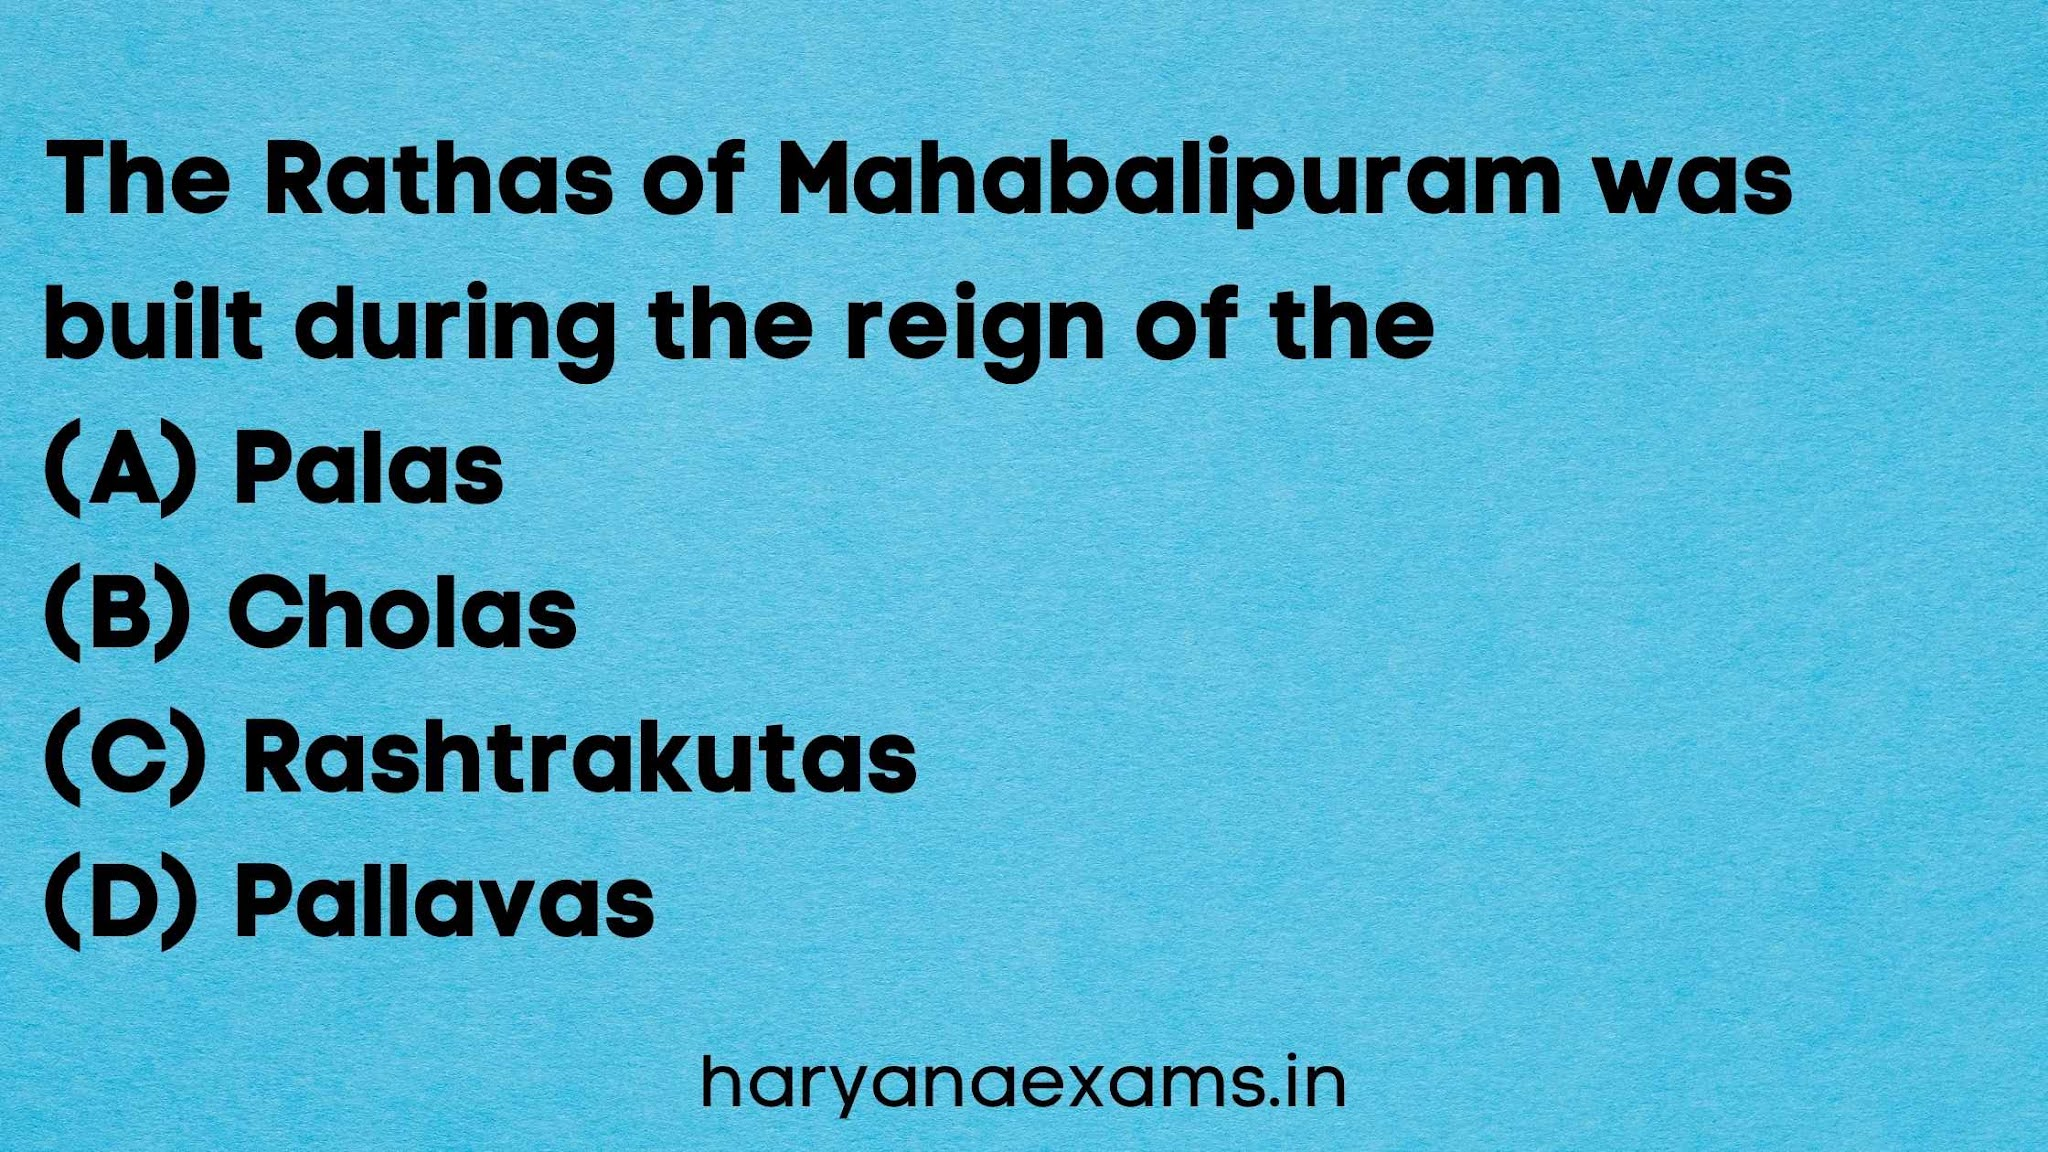 The Rathas of Mahabalipuram was built during the reign of the   (A) Palas   (B) Cholas   (C) Rashtrakutas   (D) Pallavas